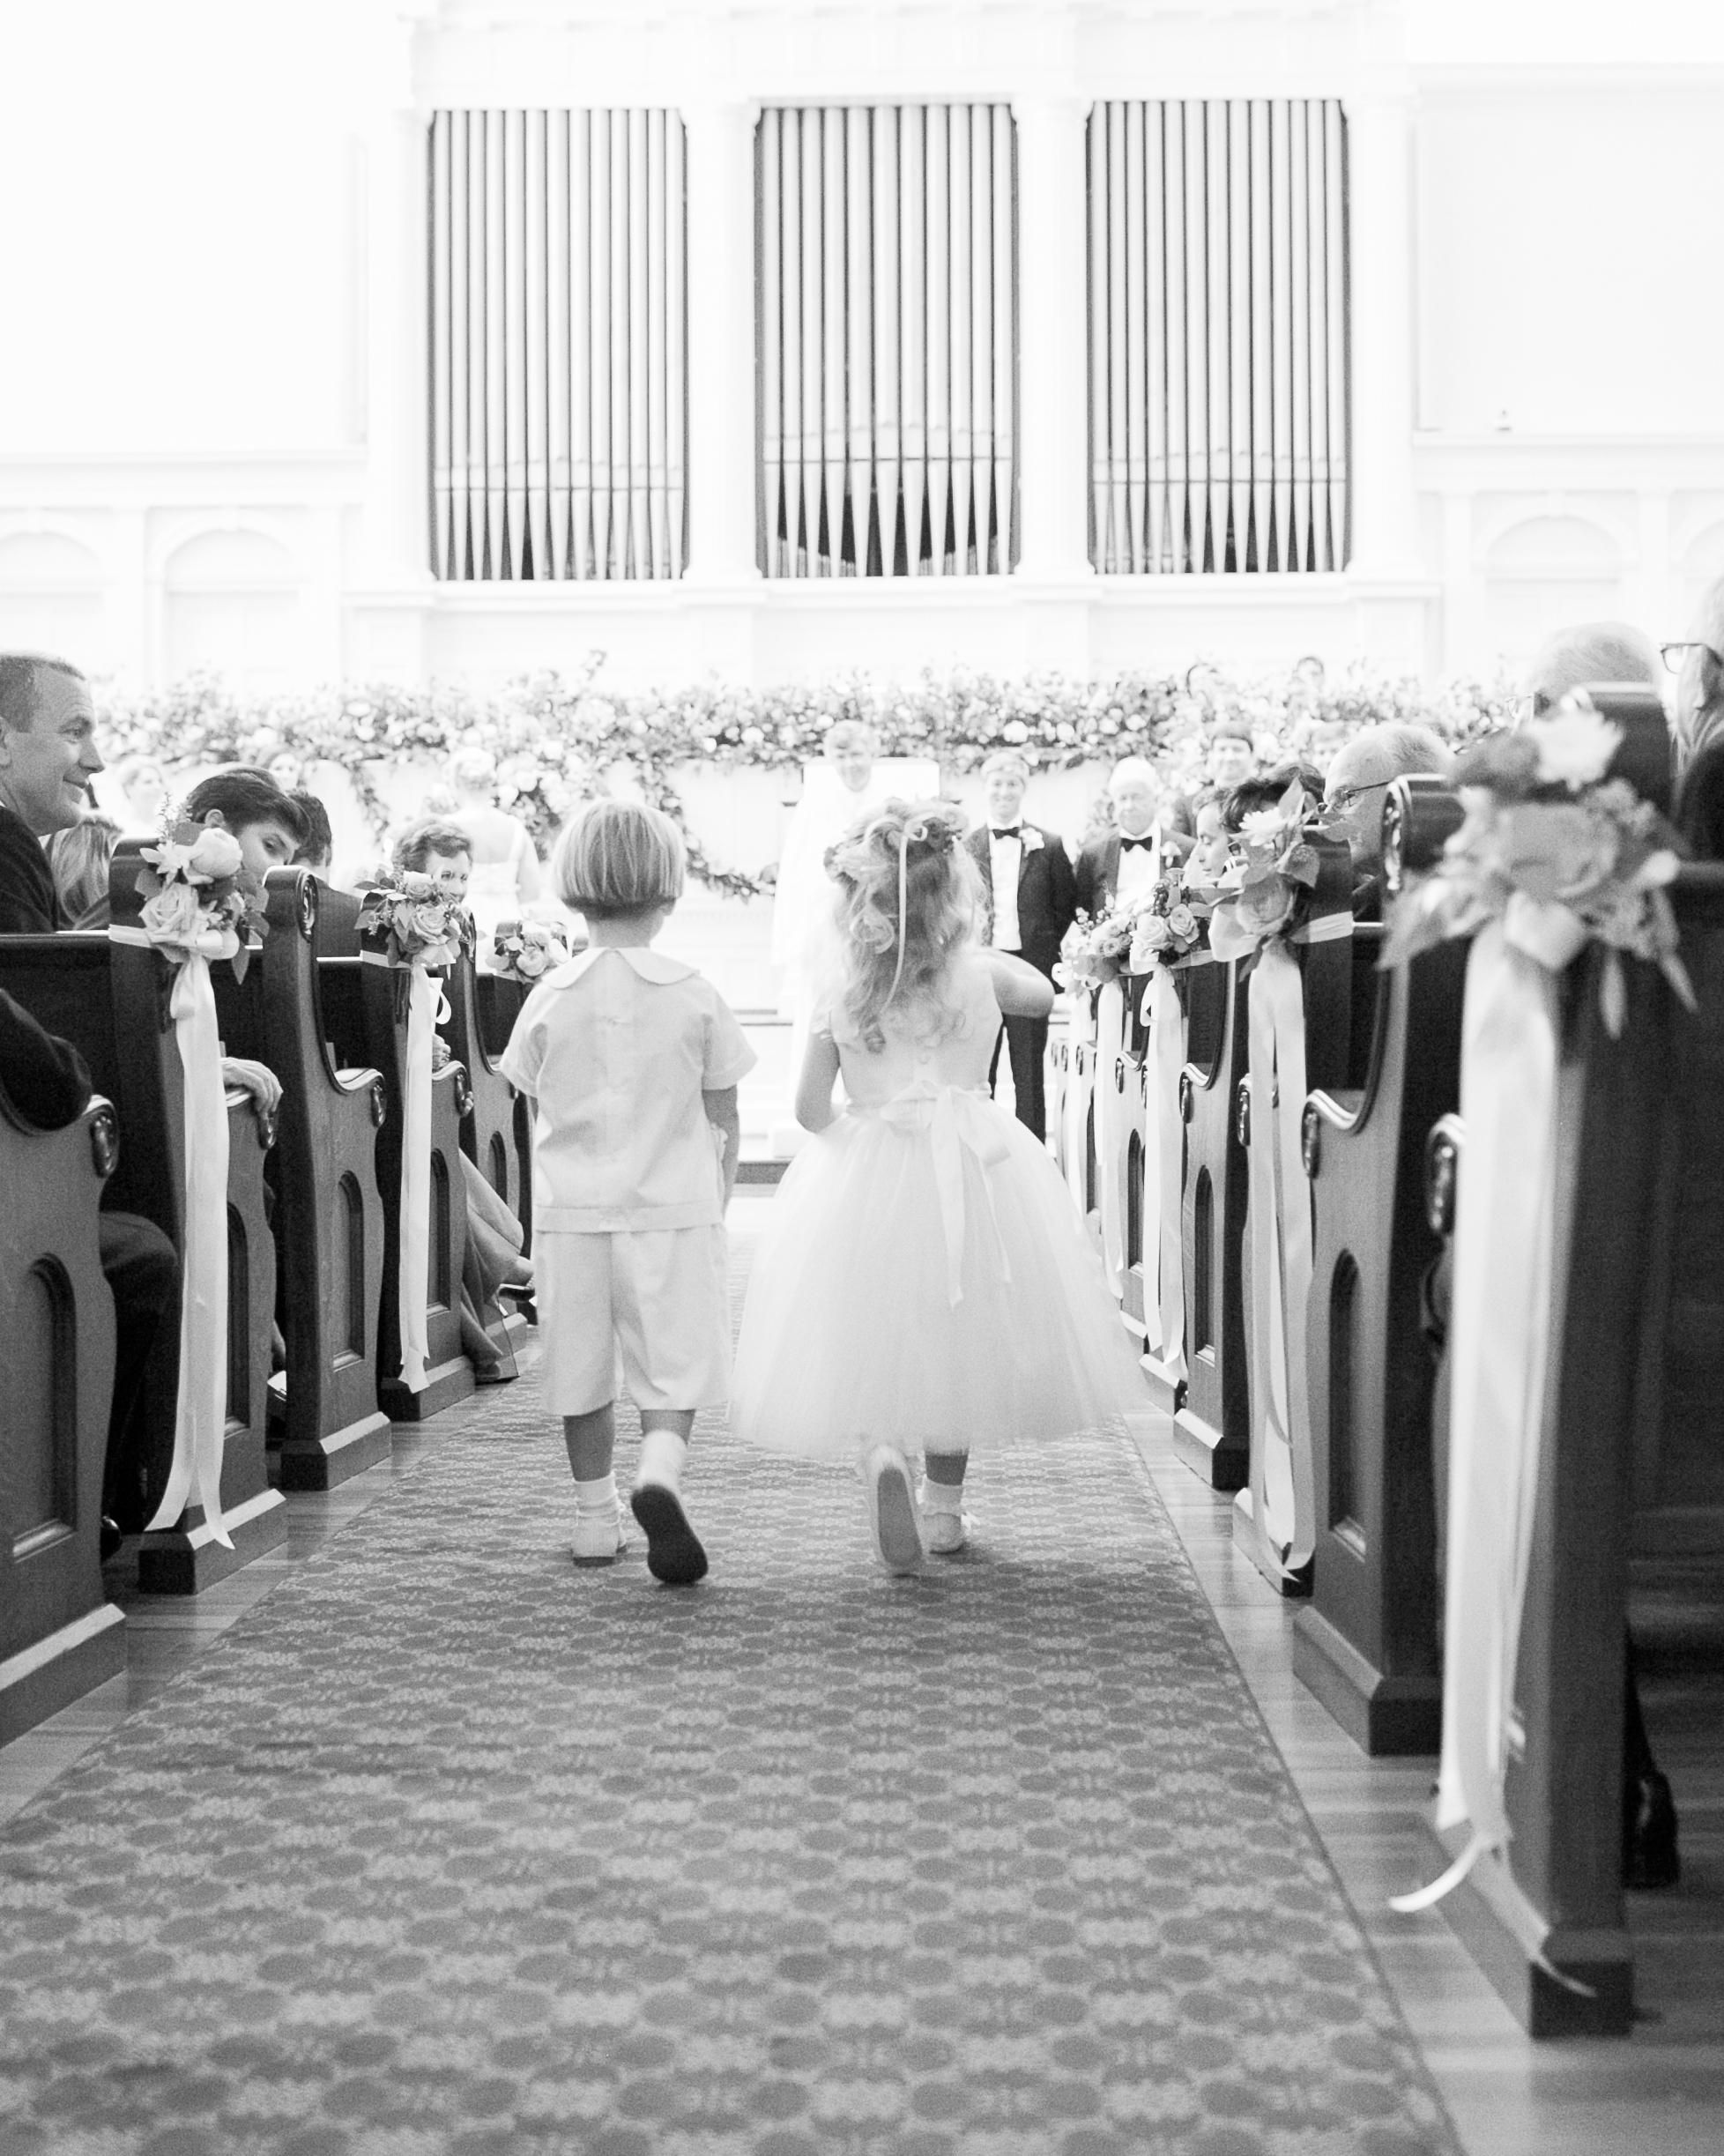 molly-patrick-wedding-kids-3453-s111760-0115.jpg